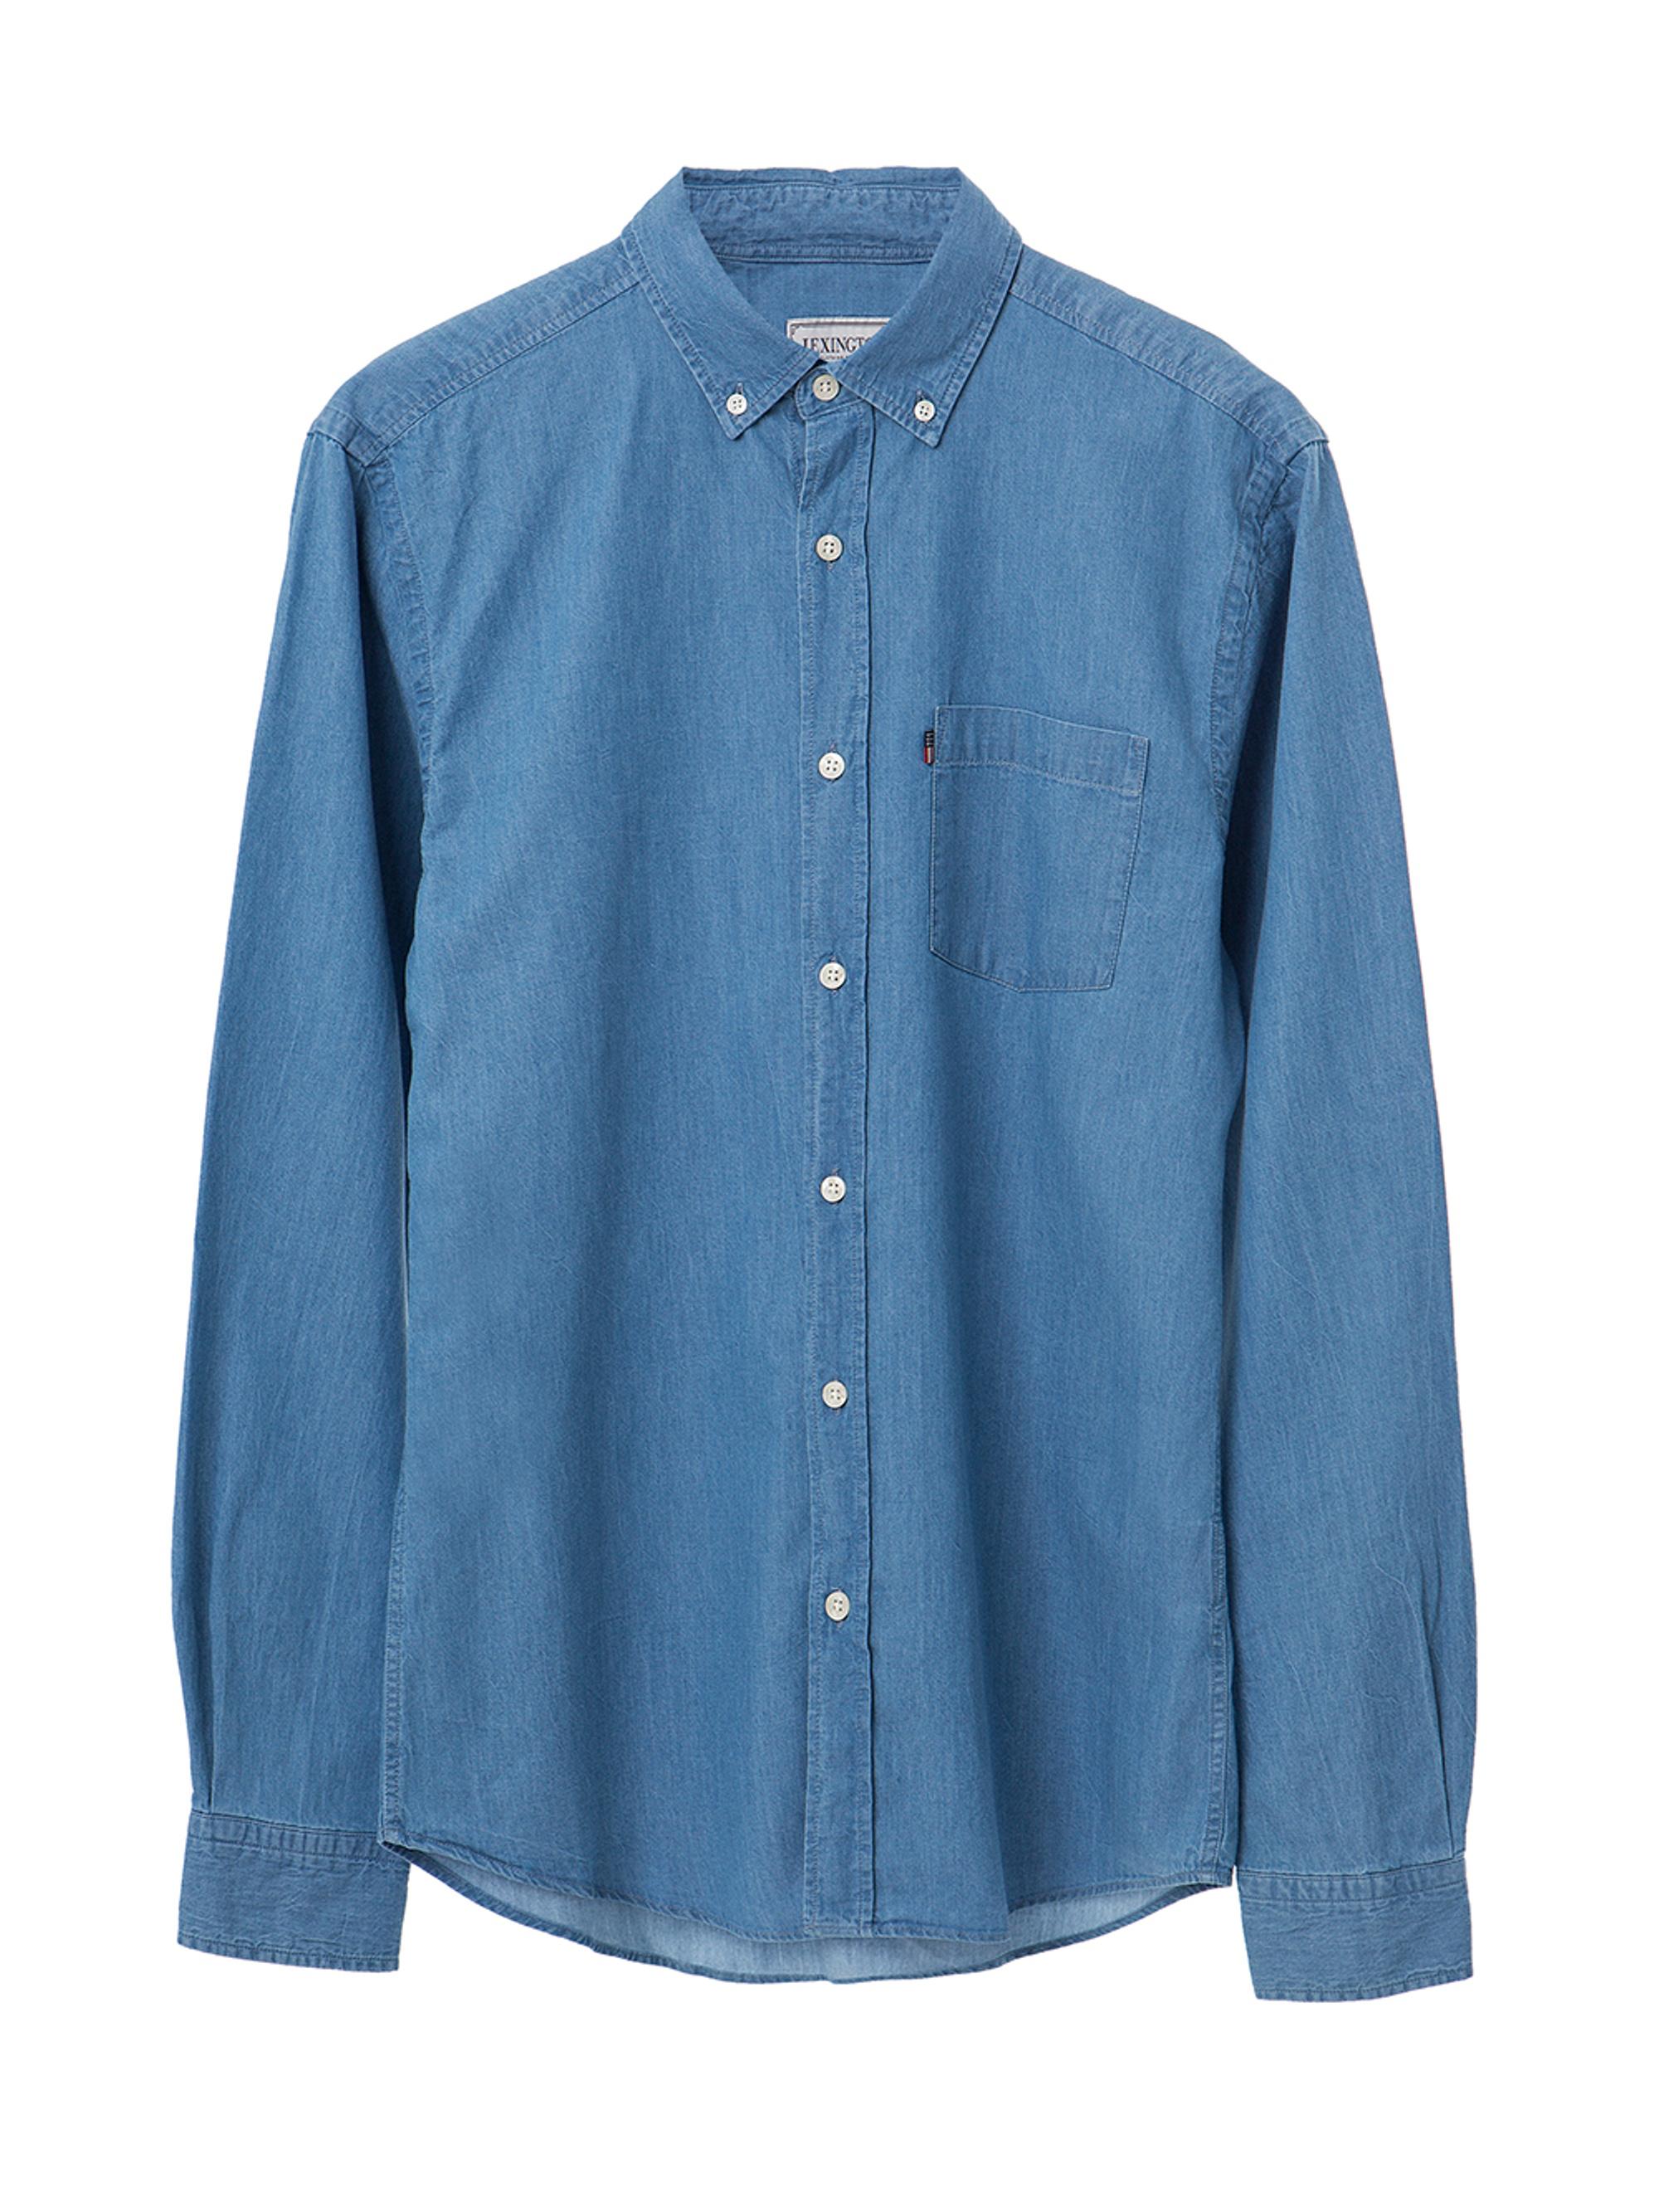 Taylor Indigo Shirt, Light Blue Denim